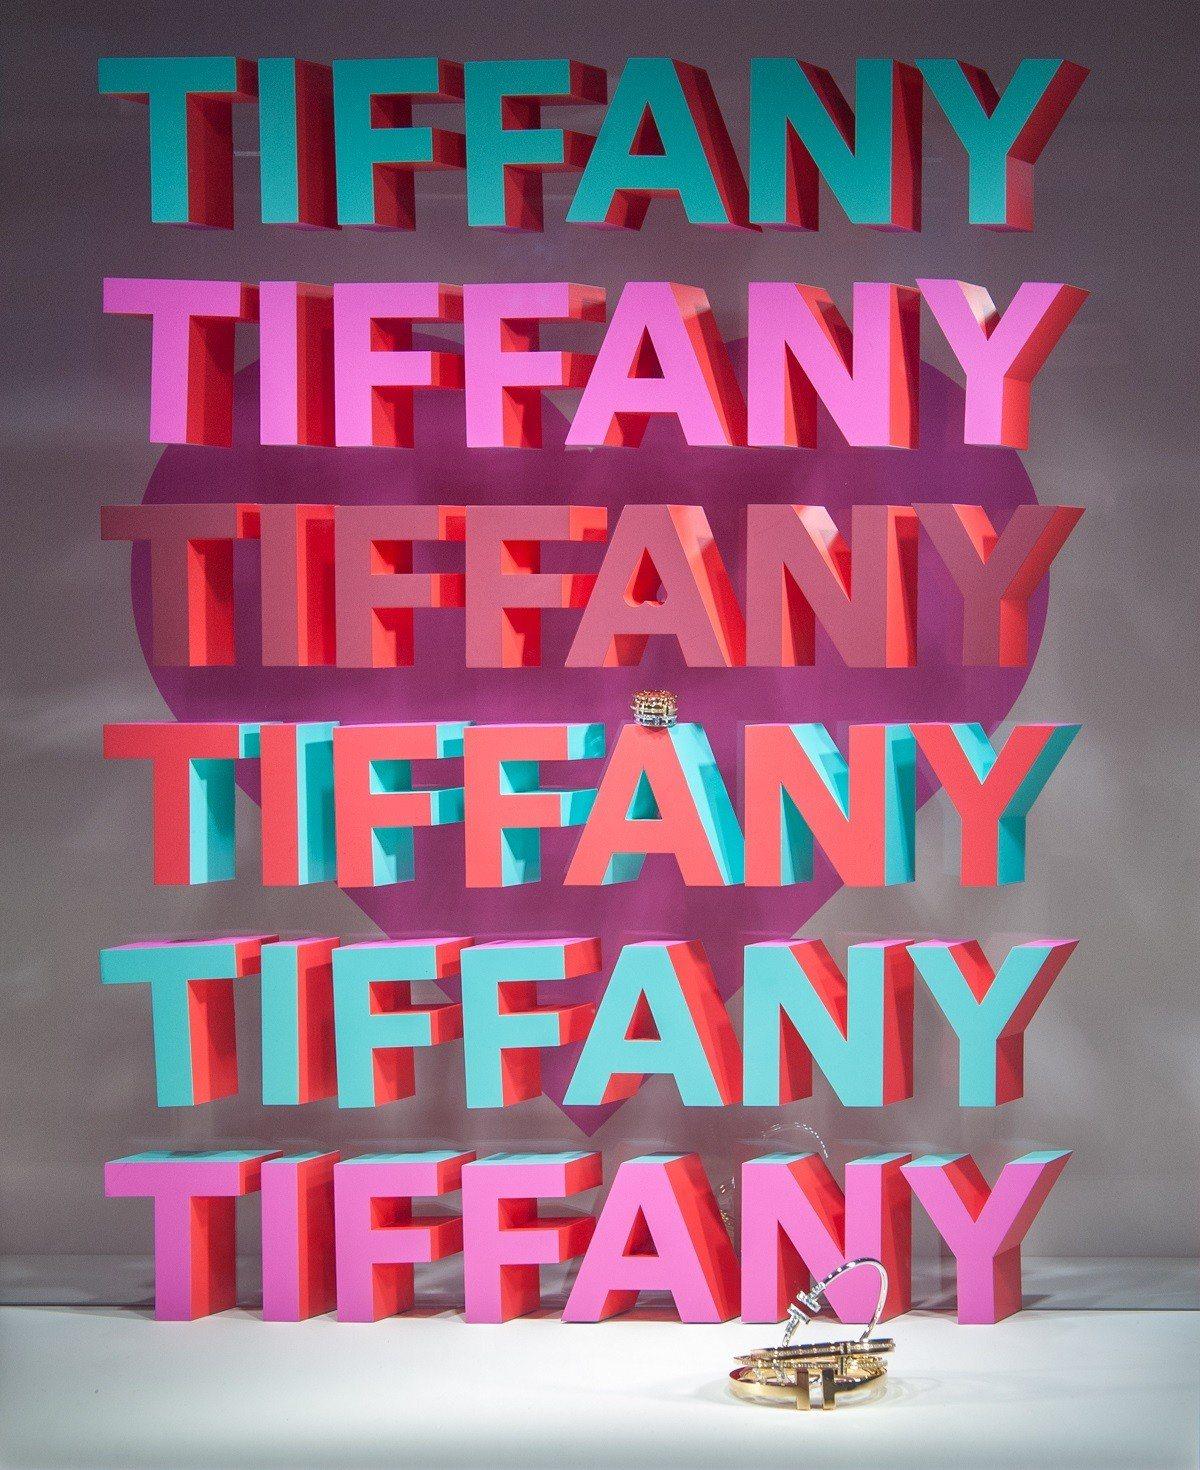 Tiffany的情人節櫥窗特別選定復古字體與配色,大膽表達熱戀心情 。圖/Tif...